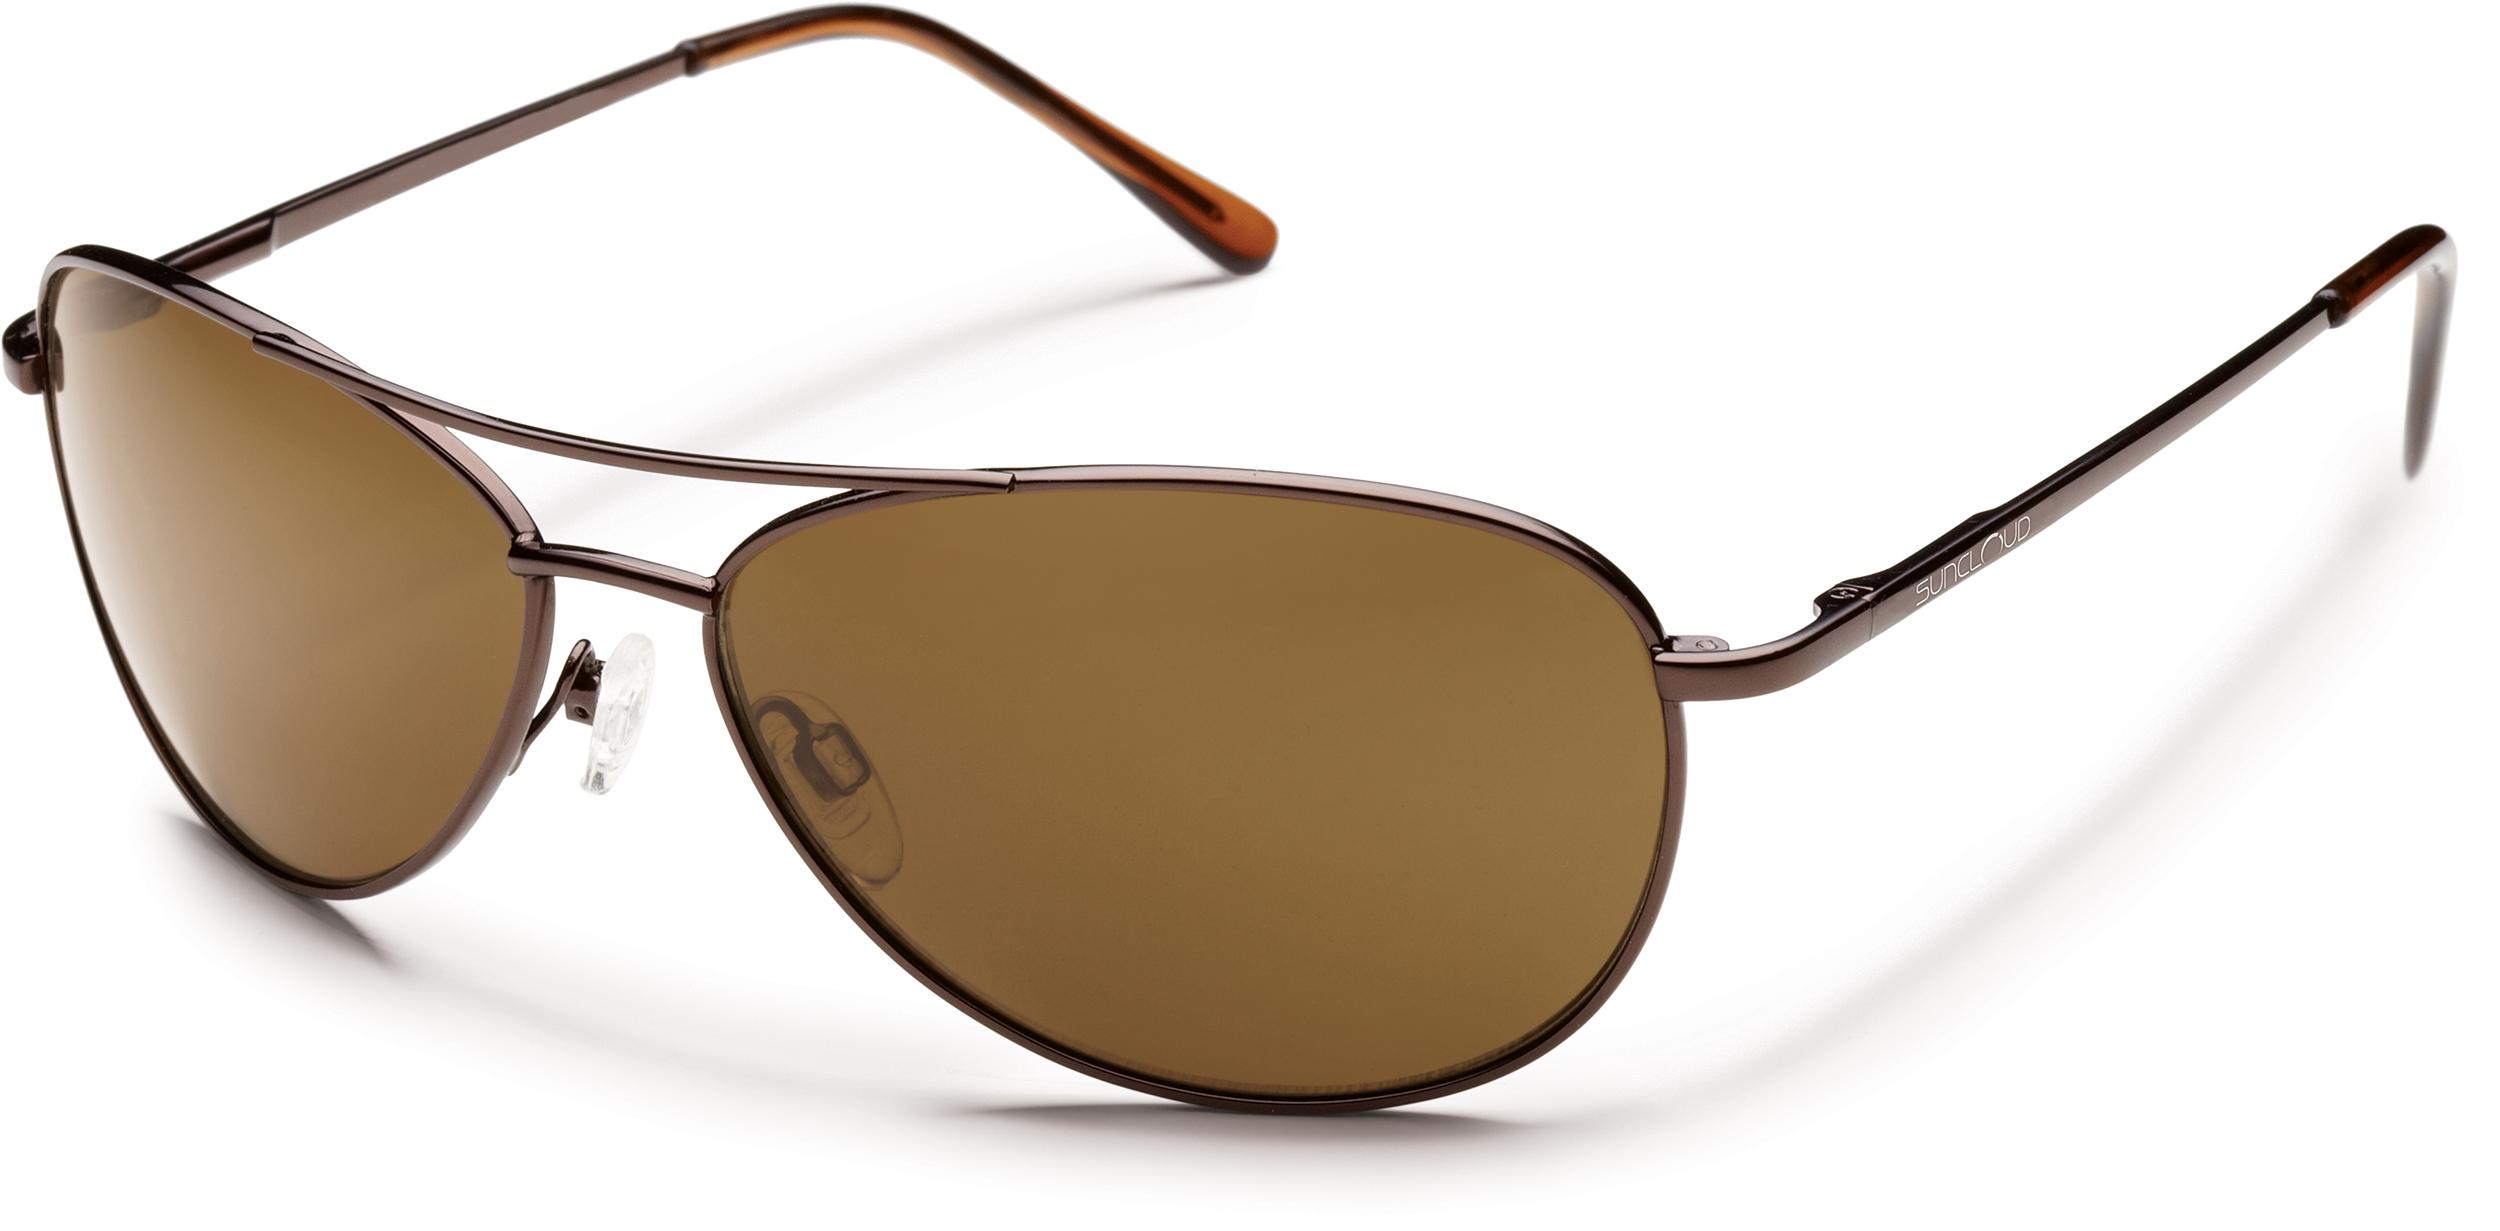 21b4c84e230 Suncloud Patrol Polarized Sunglasses - Unisex